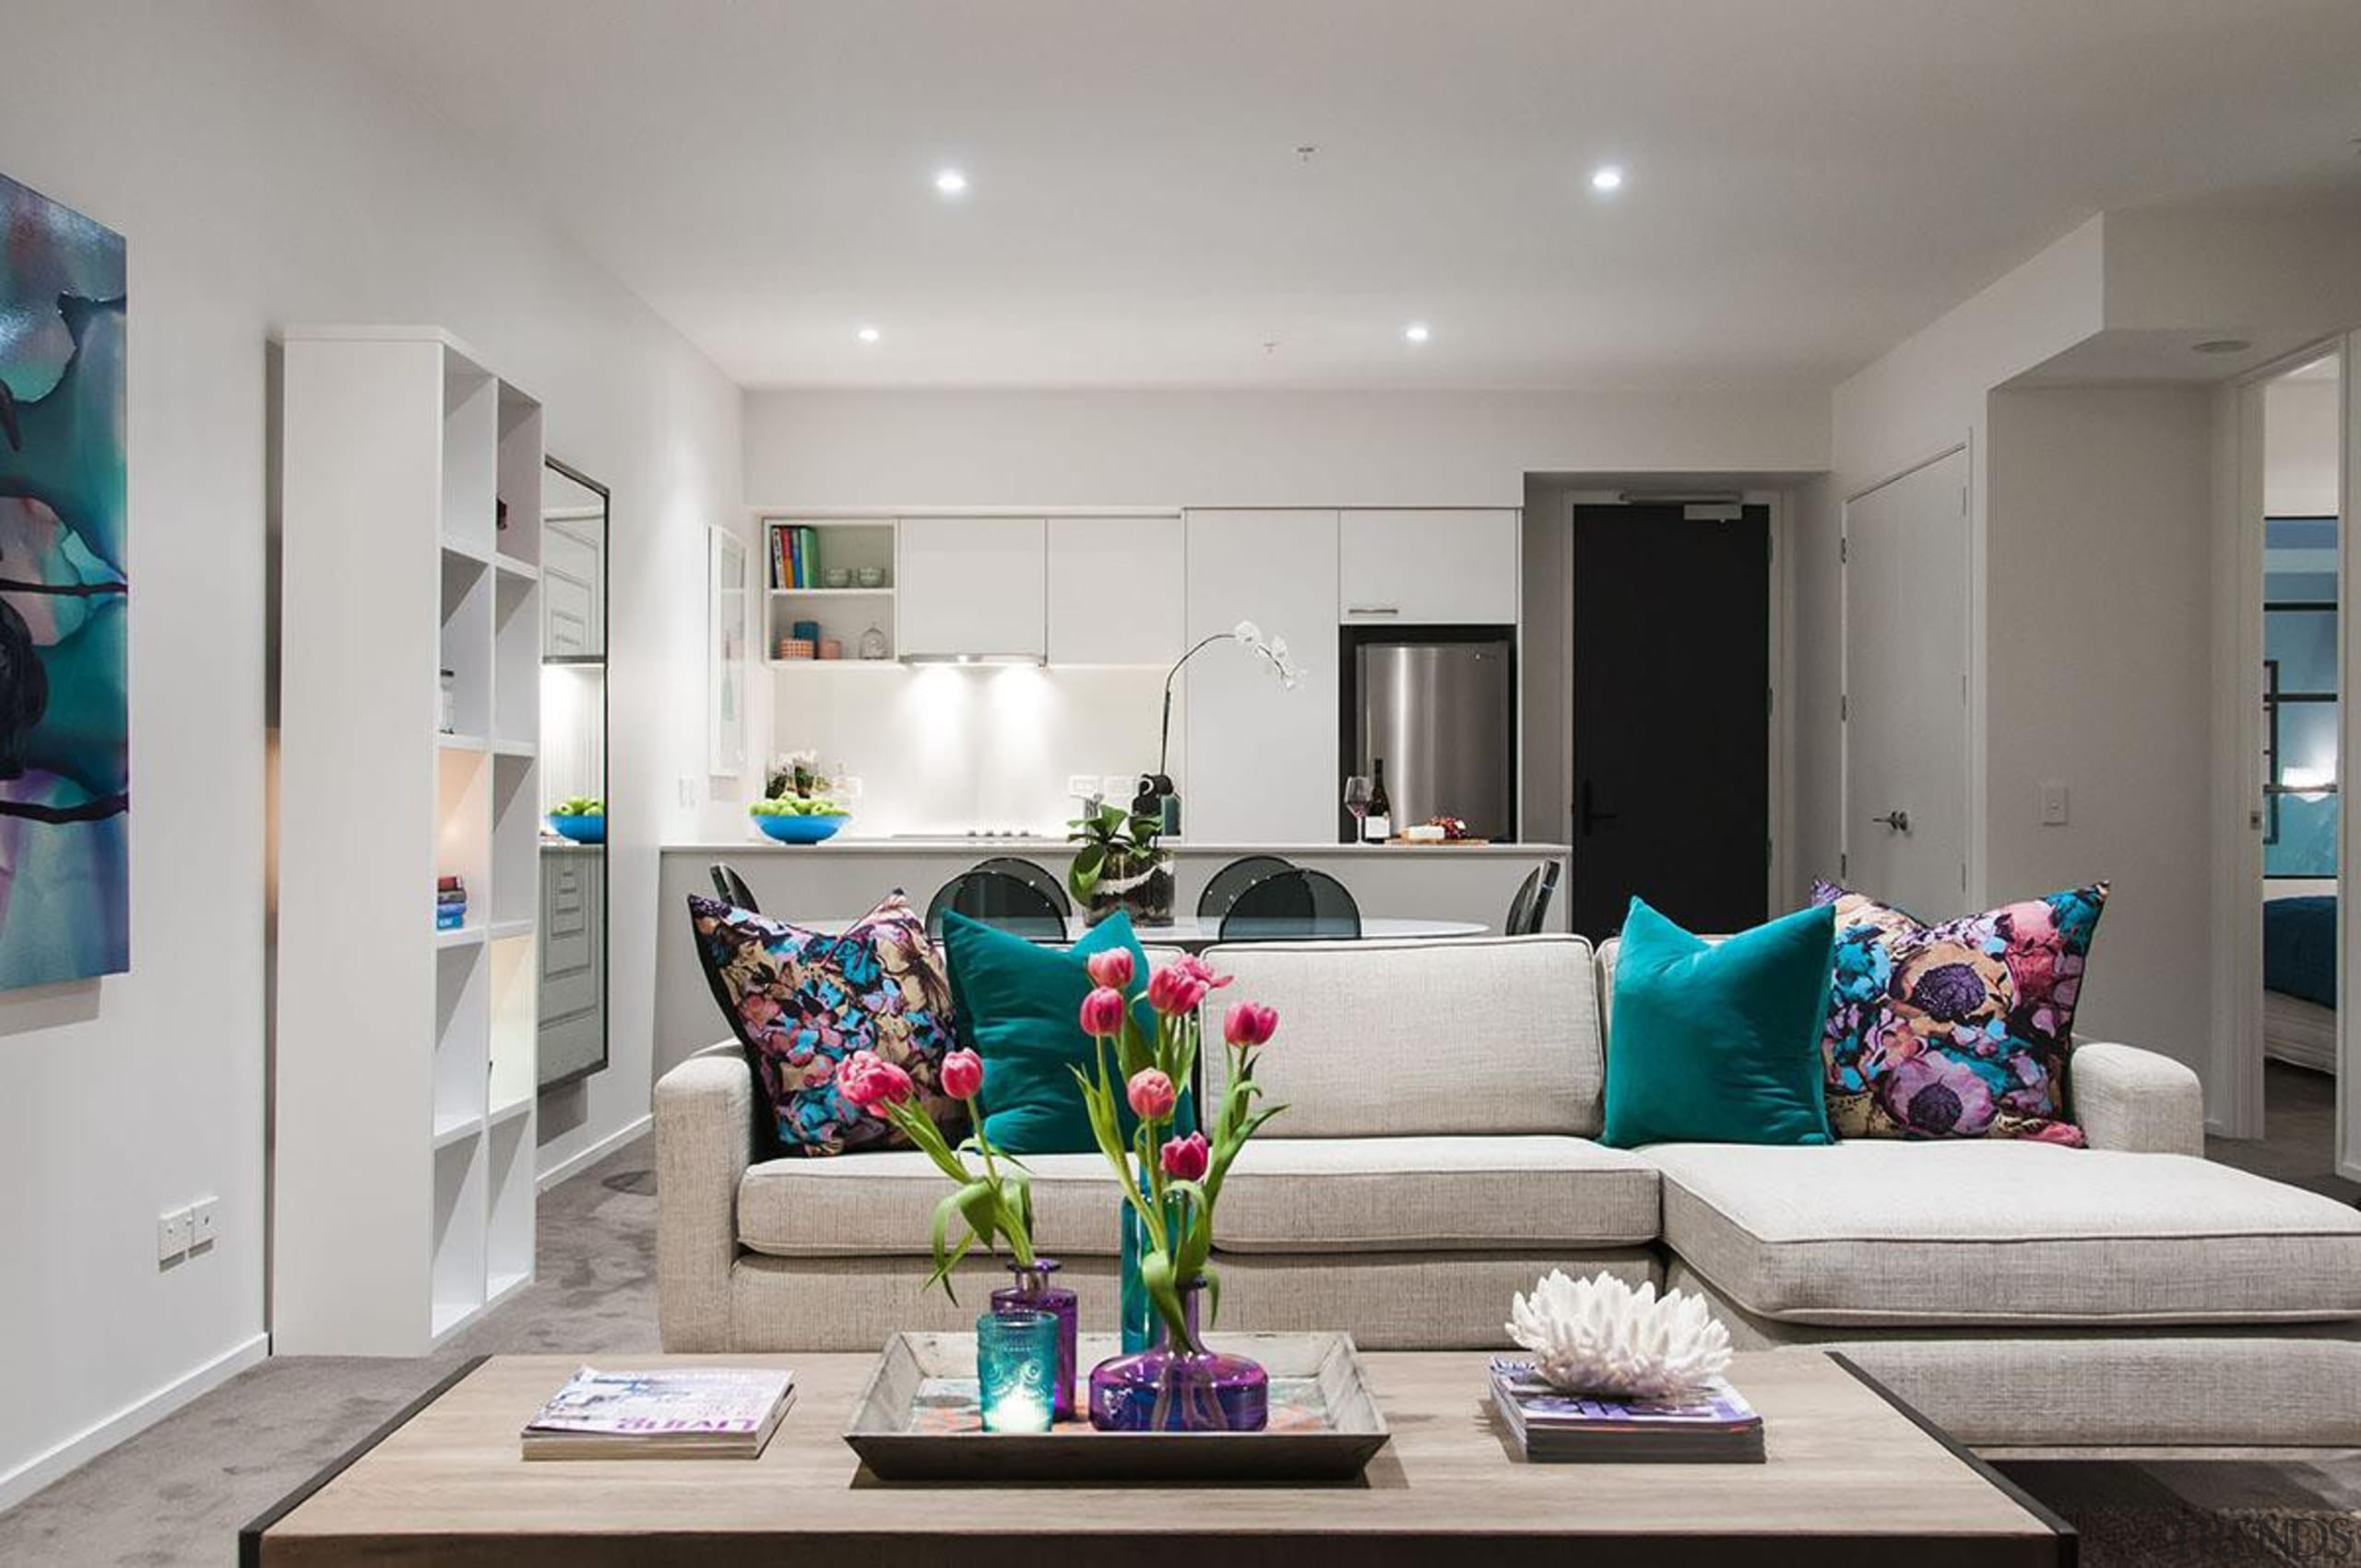 NOMINEE132 Vincent Street (1 of 4) - Hawkins home, interior design, living room, real estate, room, gray